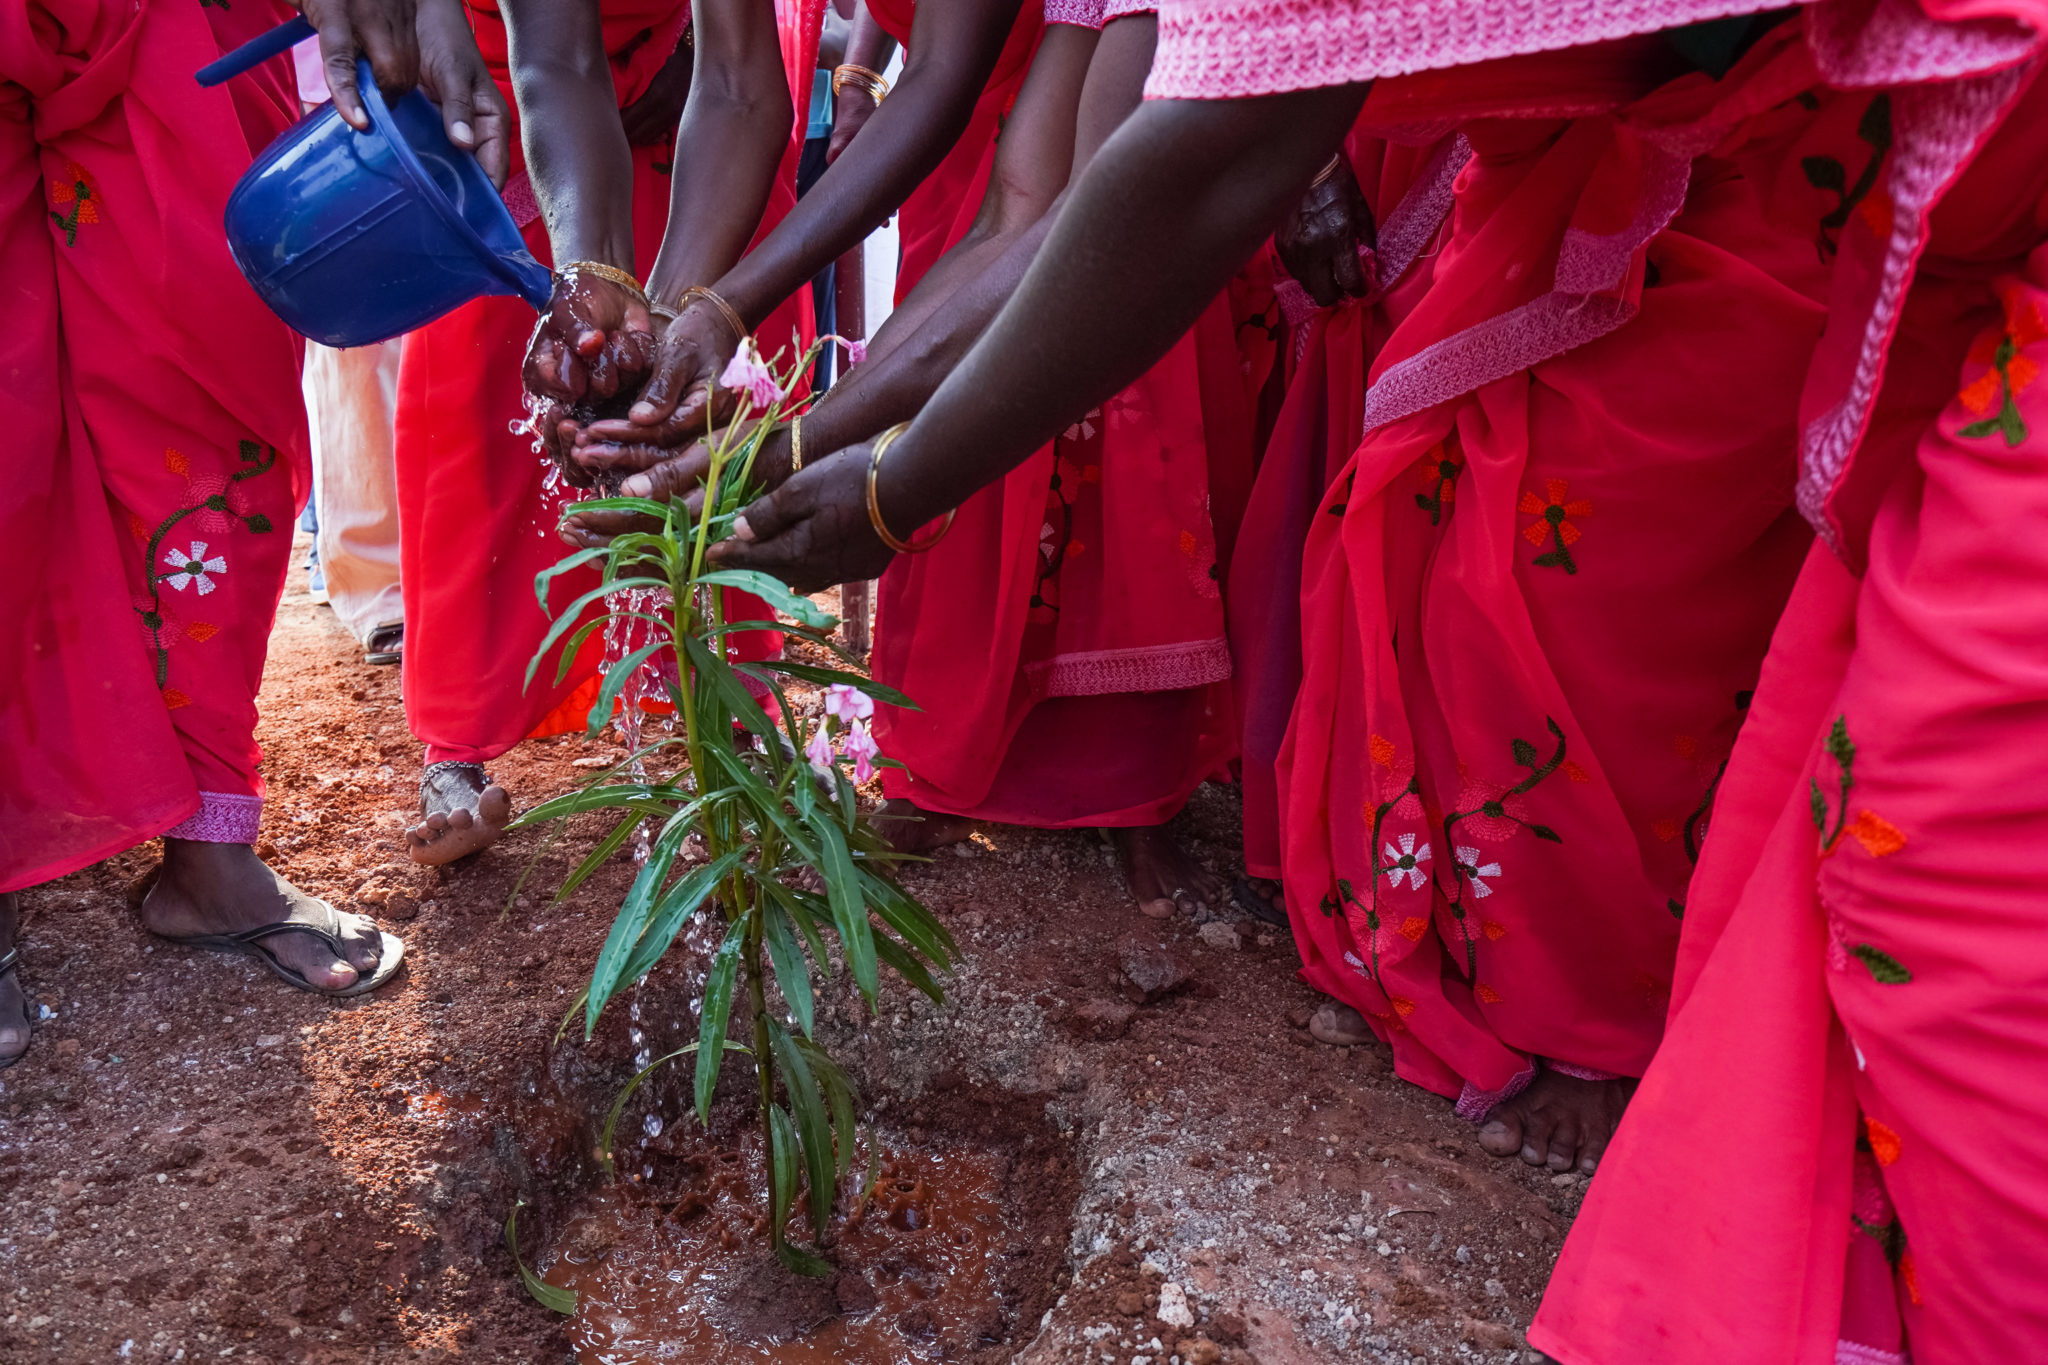 kynarou-inde-eau-sanitaire-inauguration-arbres